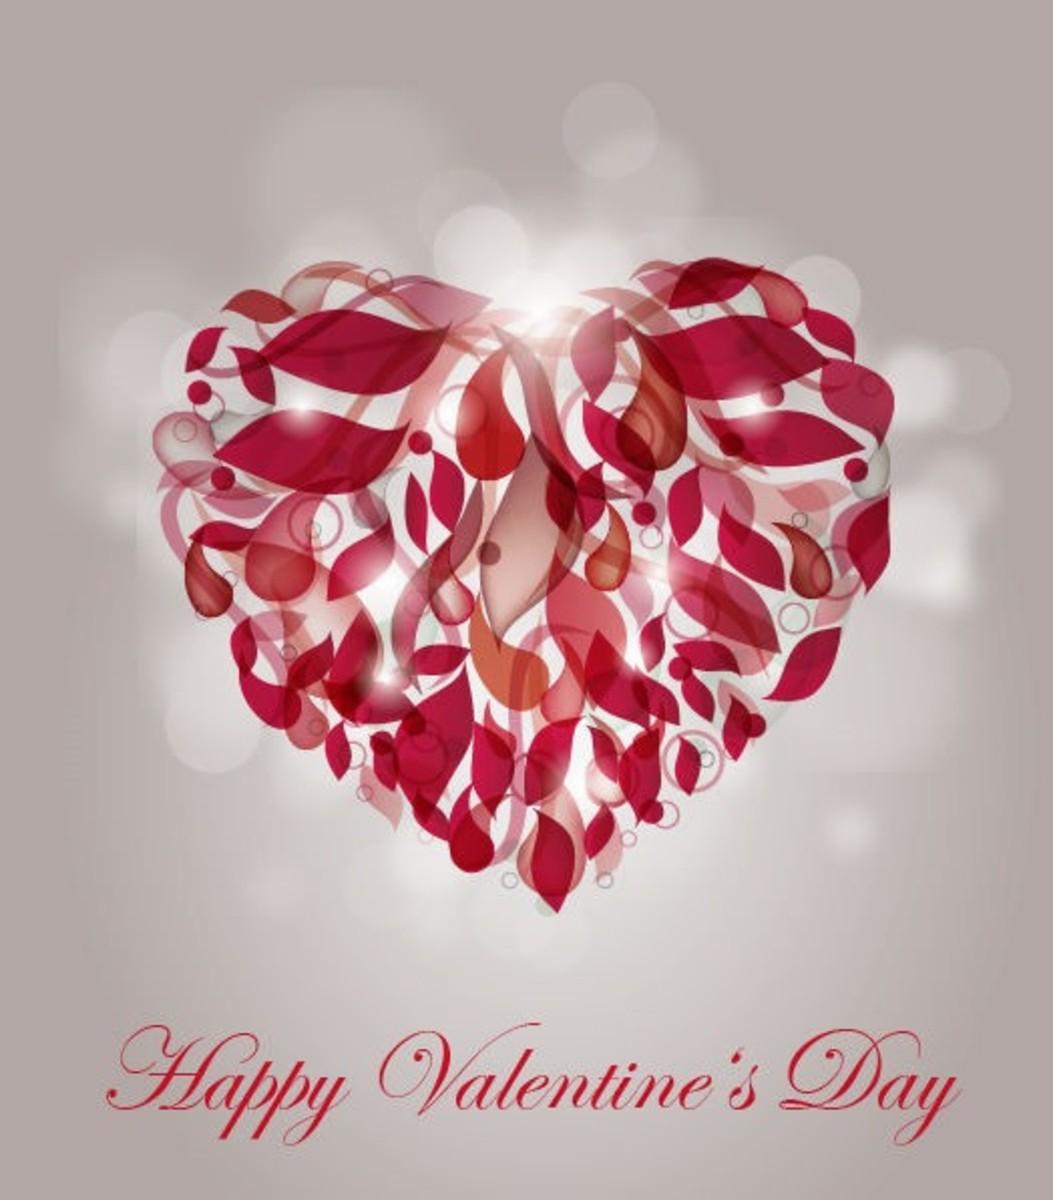 Happy Valentine's Day Graphic Design